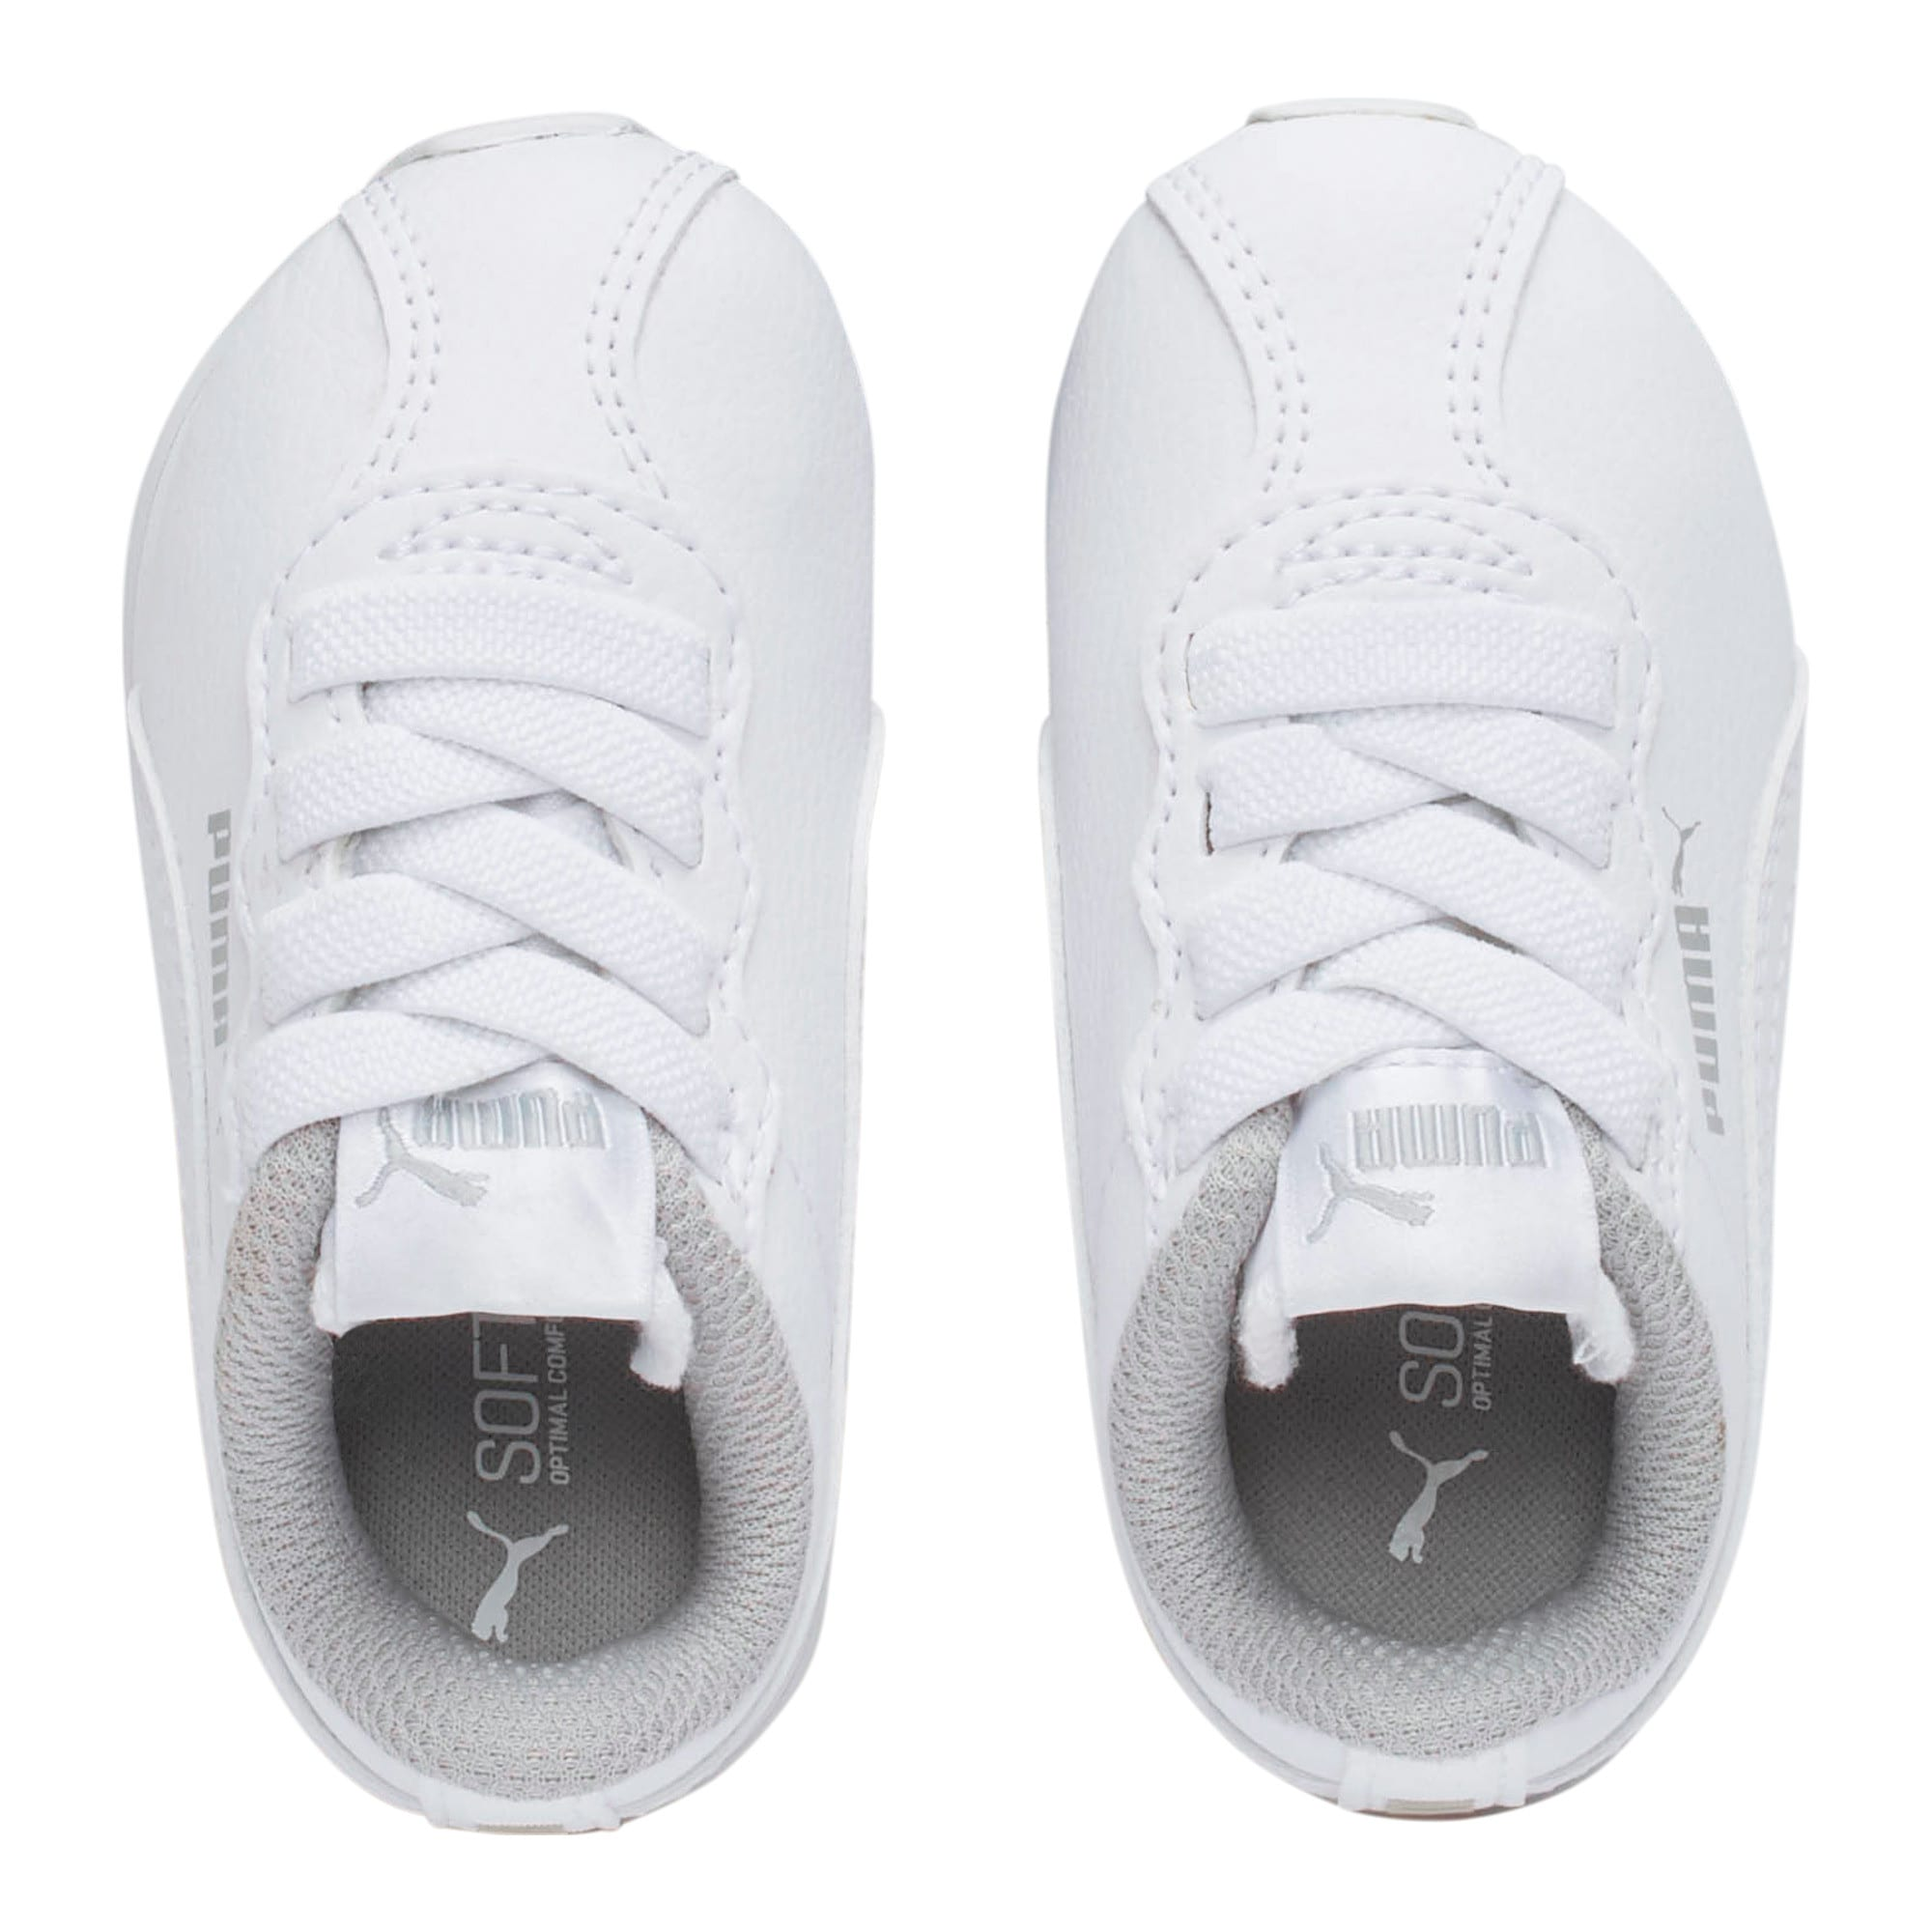 Thumbnail 6 of Turin II AC Toddler Shoes, Puma White-Puma White, medium